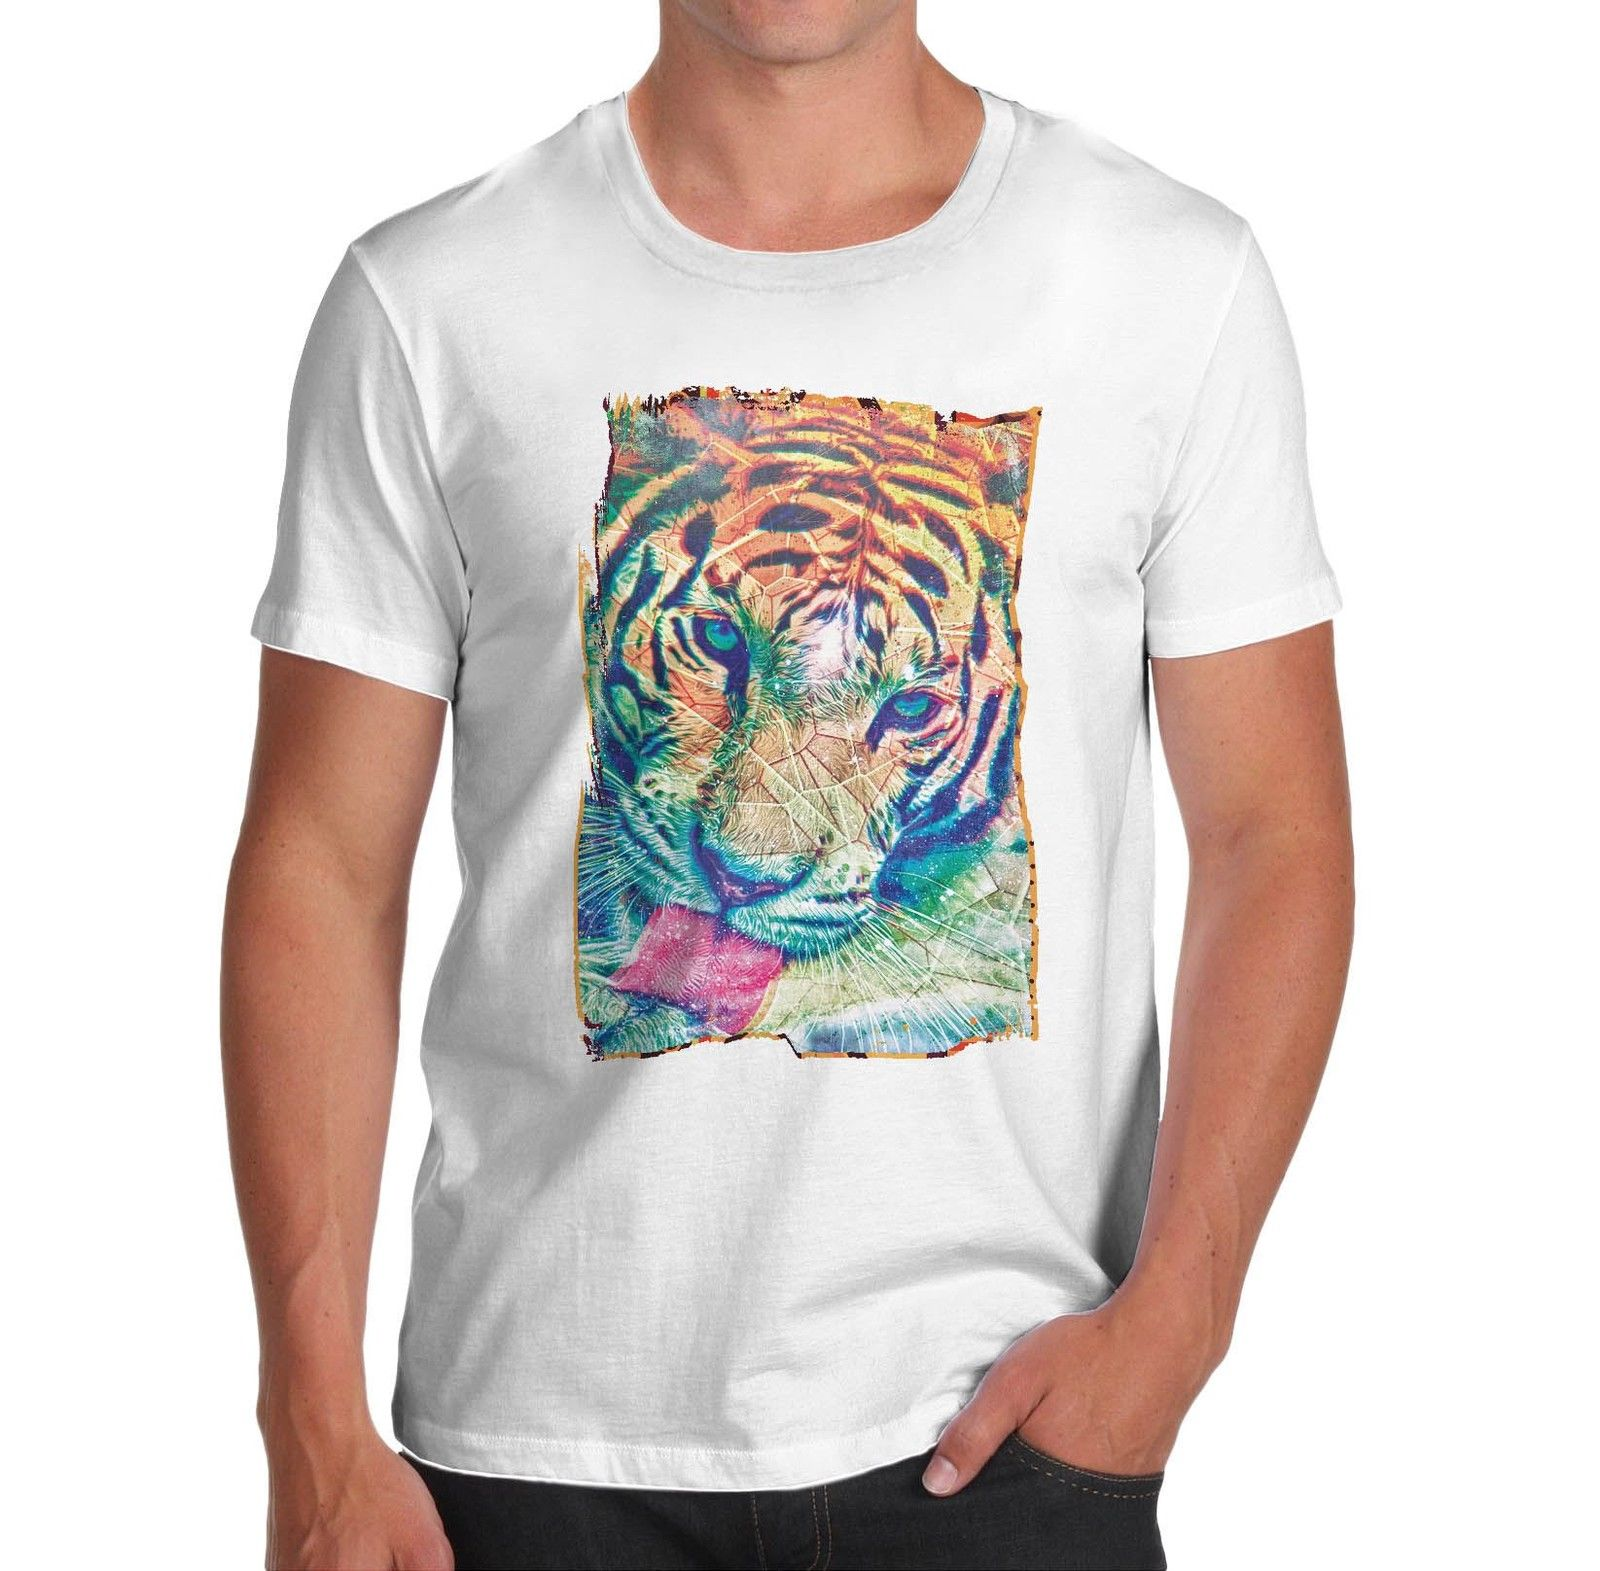 Design your own t shirt cheap custom shirt for Custom shirts design your own